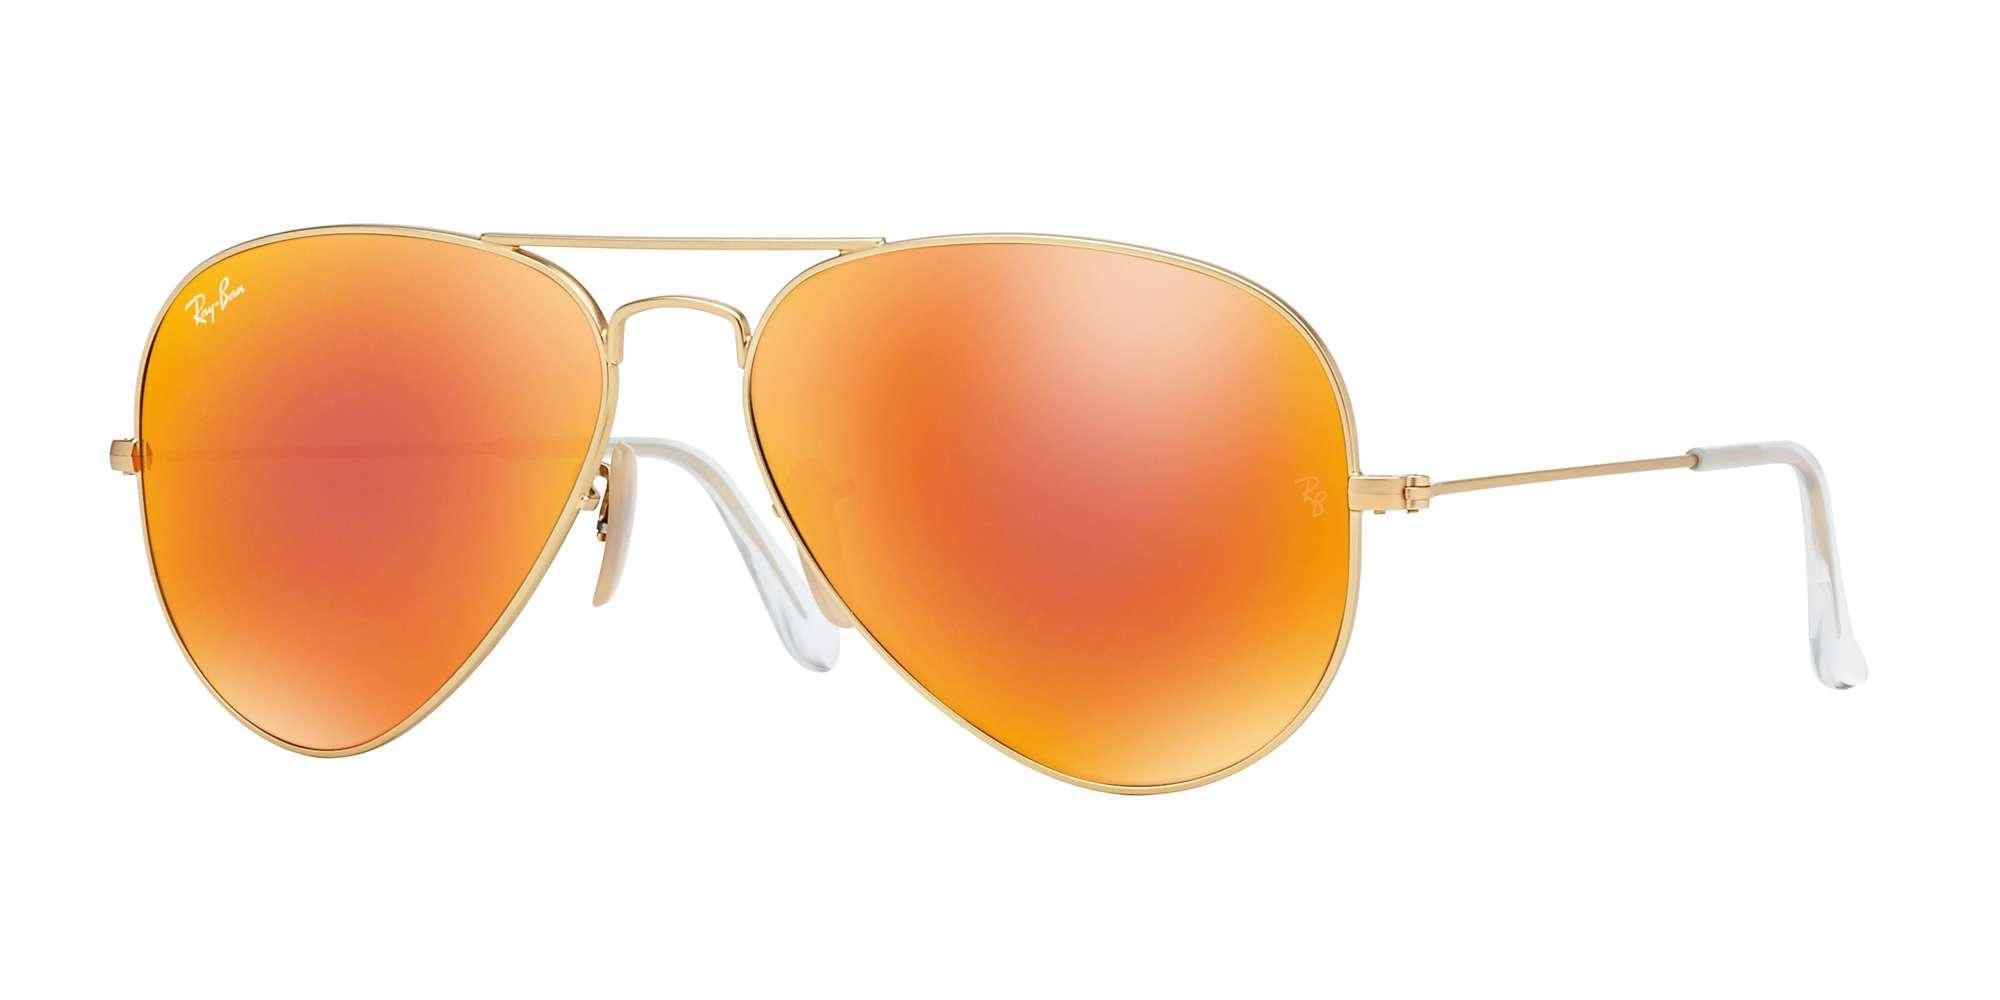 MATTE GOLD / CRYSTAL BROWN MIRROR ORANGE lenses